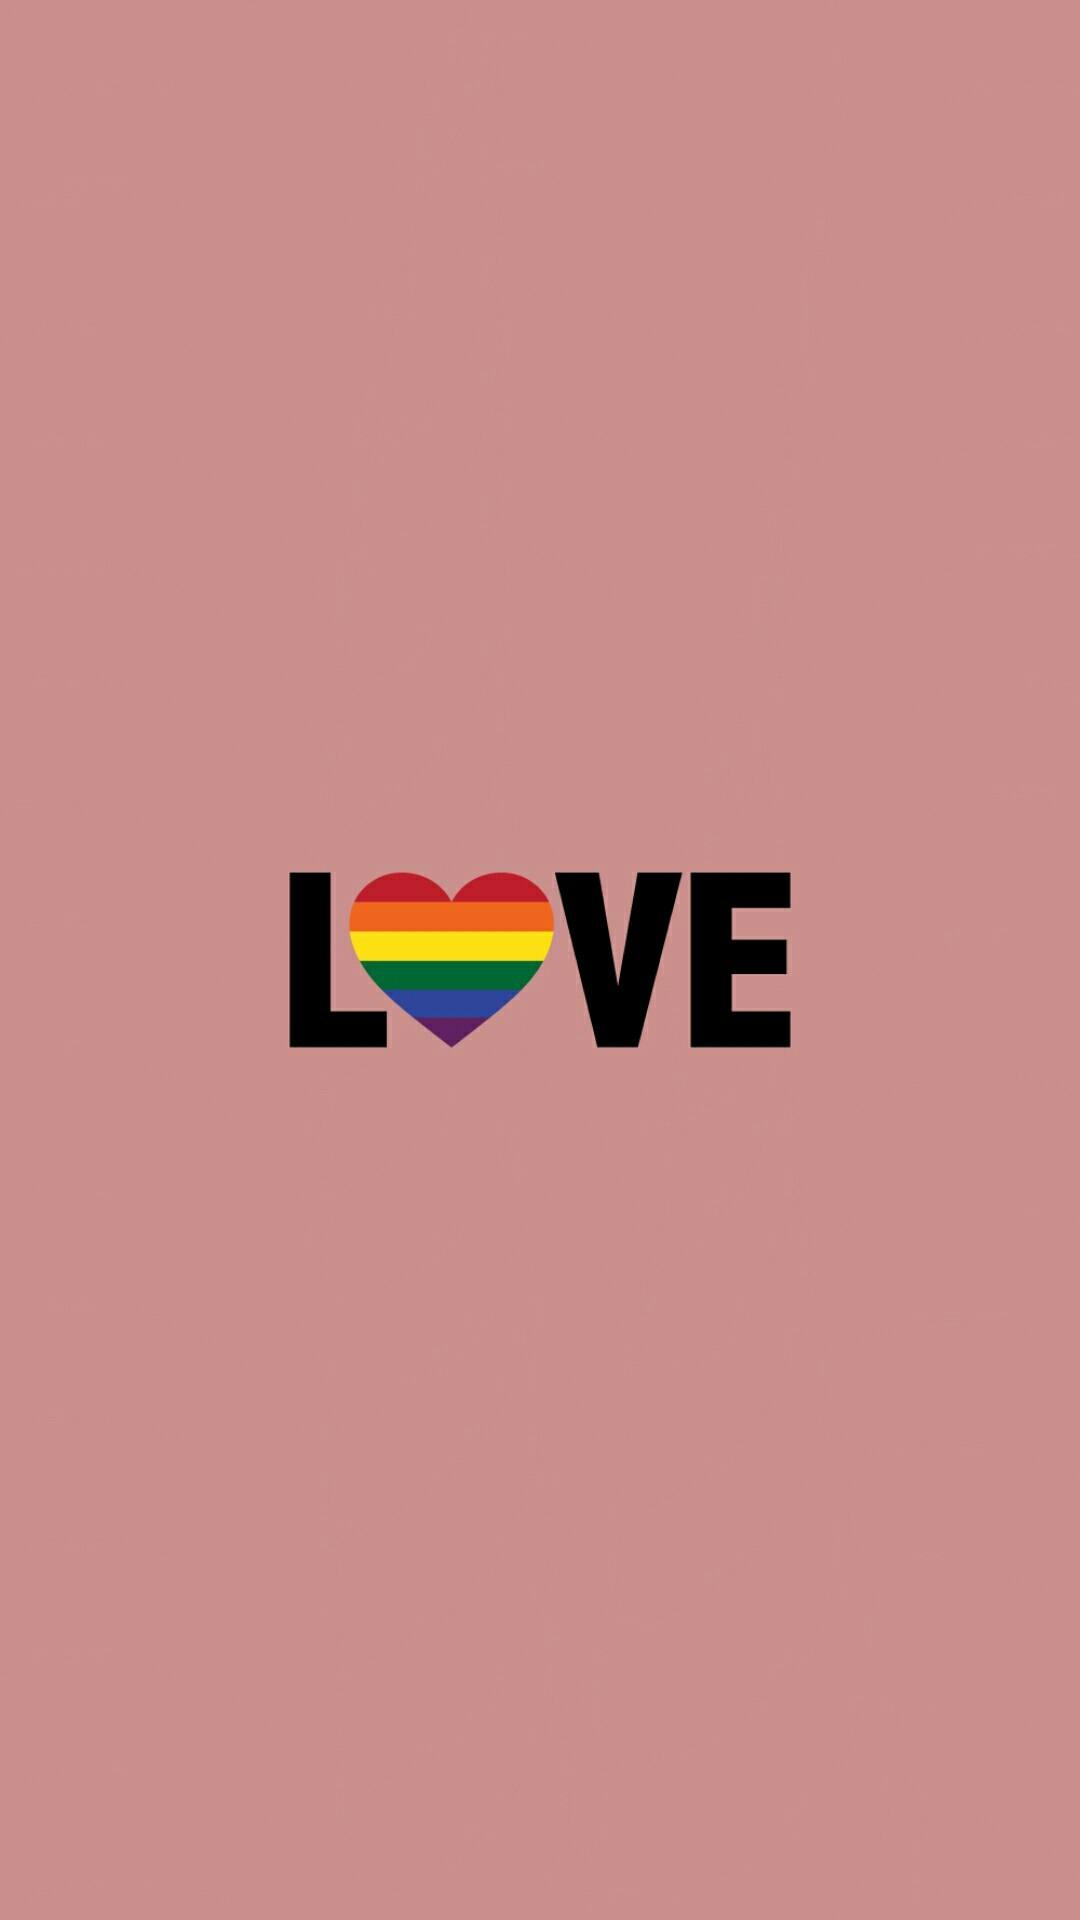 pride / lgbt / gay / lesbian / bi / trans / love is love is